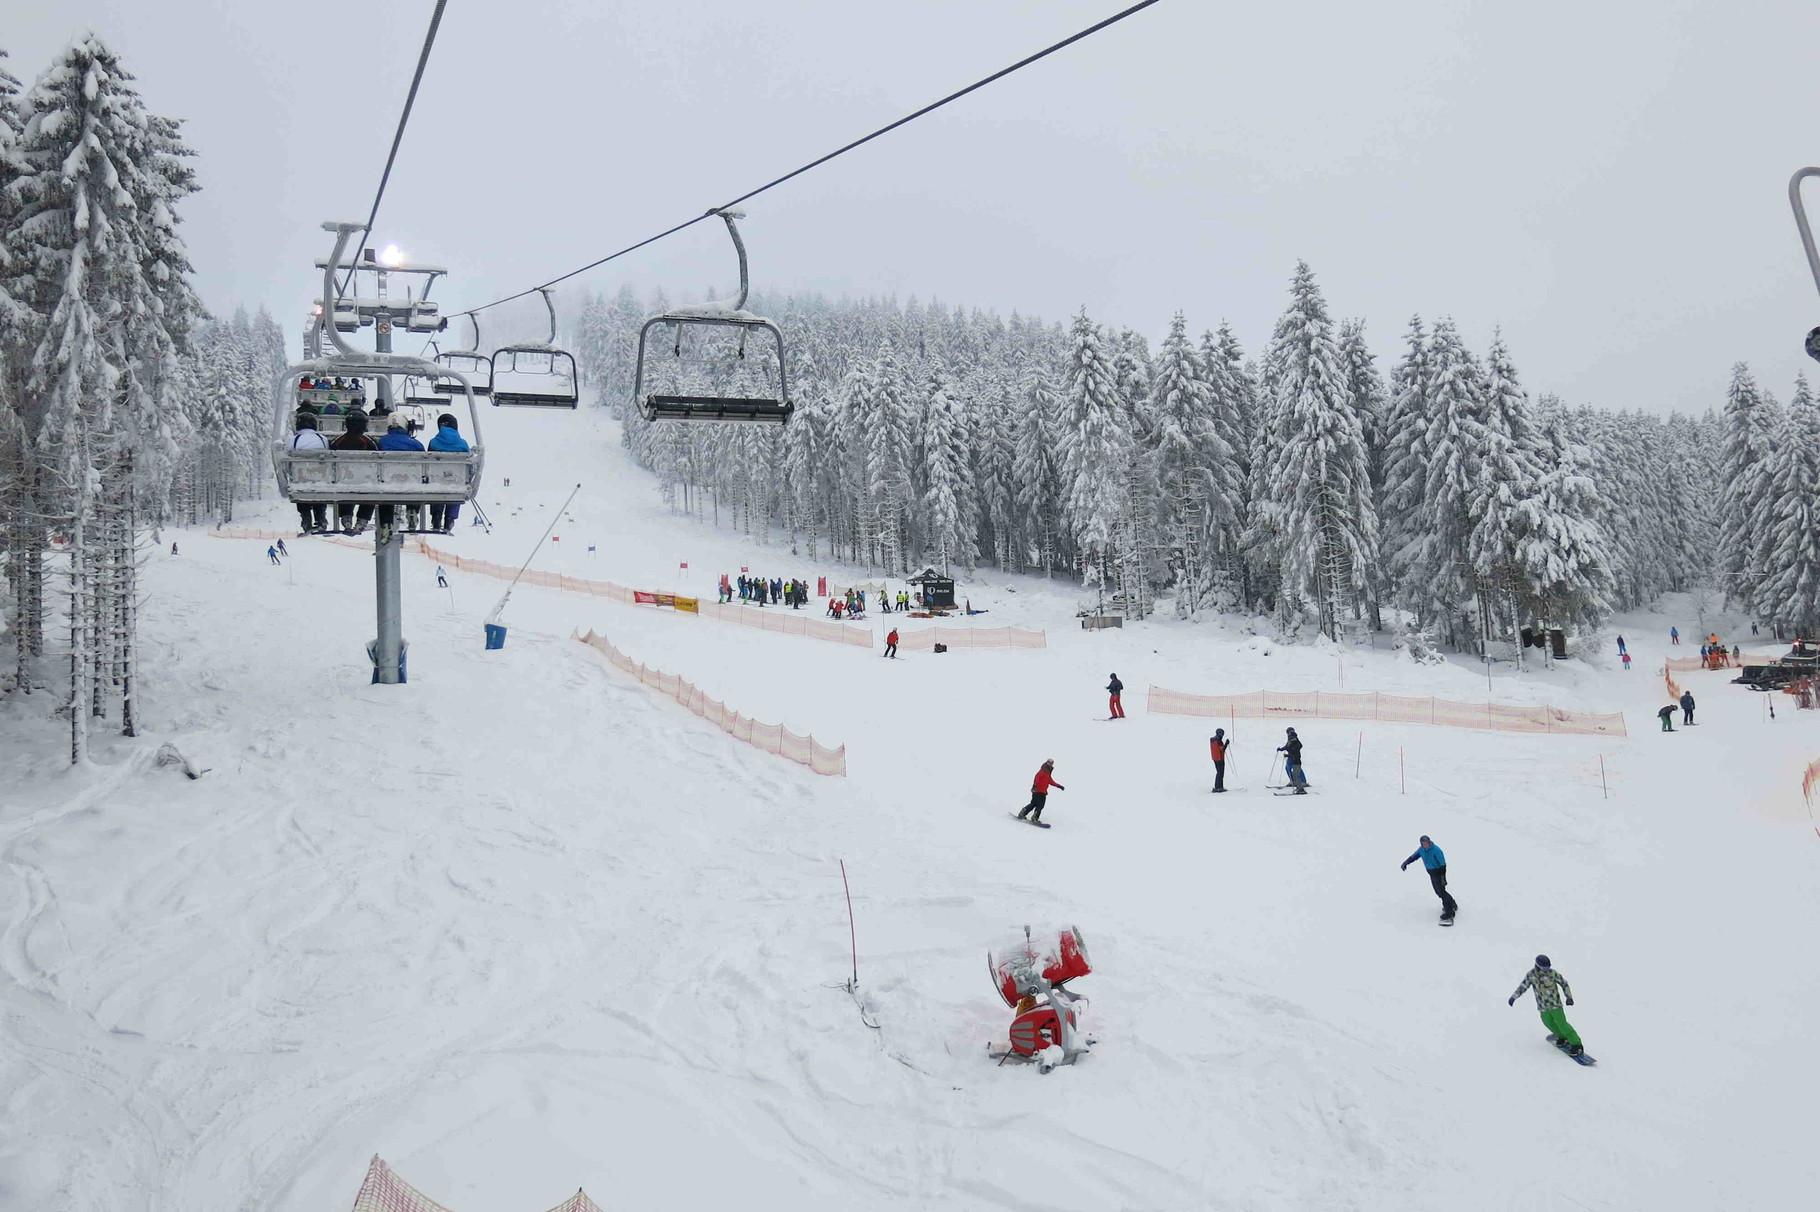 skigebiet wurmberg